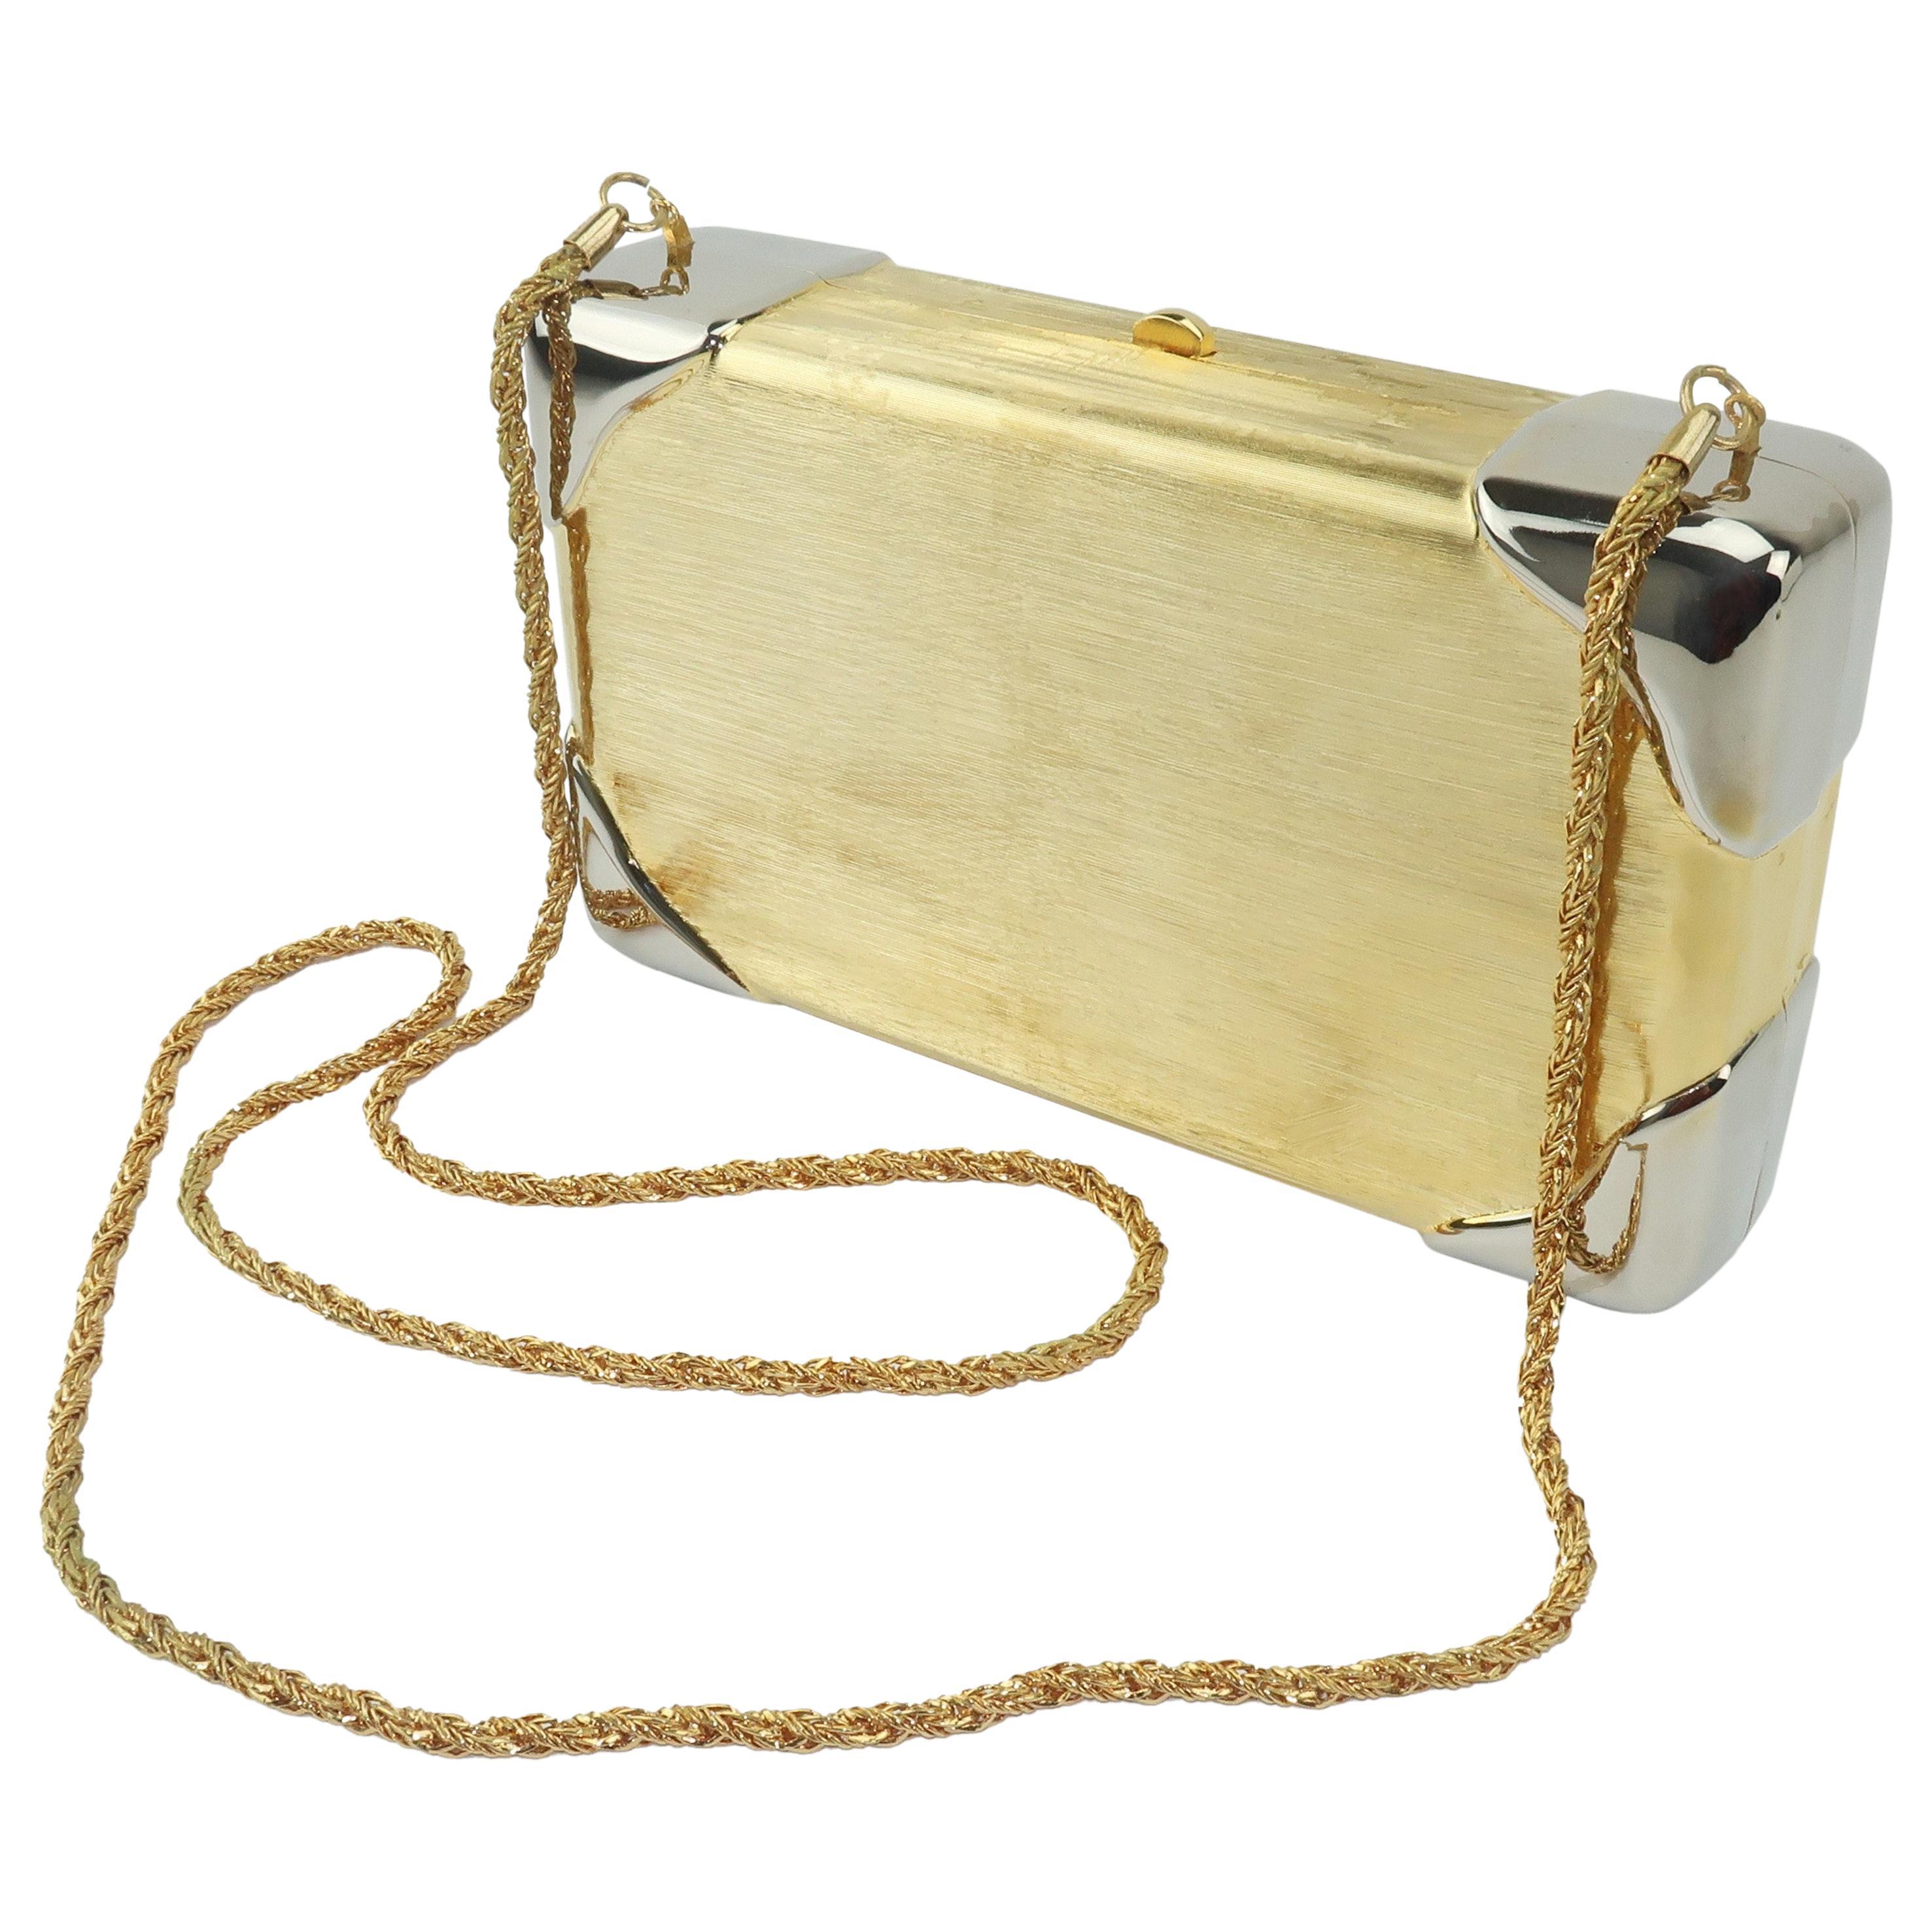 1970's Walborg Brushed Gold & Silver Box Handbag Clutch